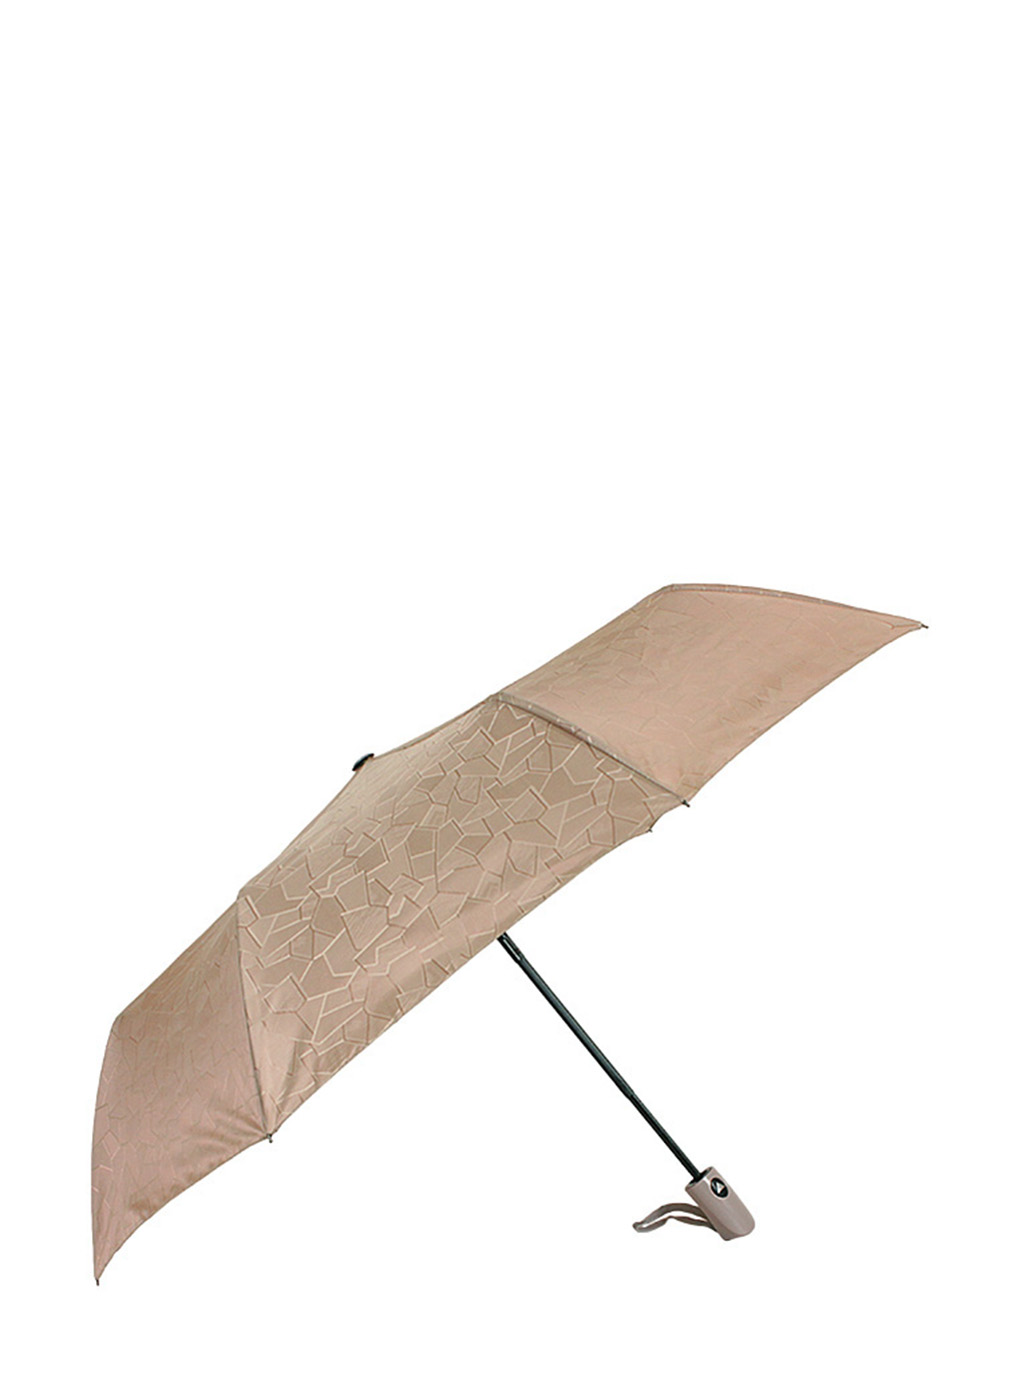 Зонт полуавтоматический женский 01, Lorentino фото